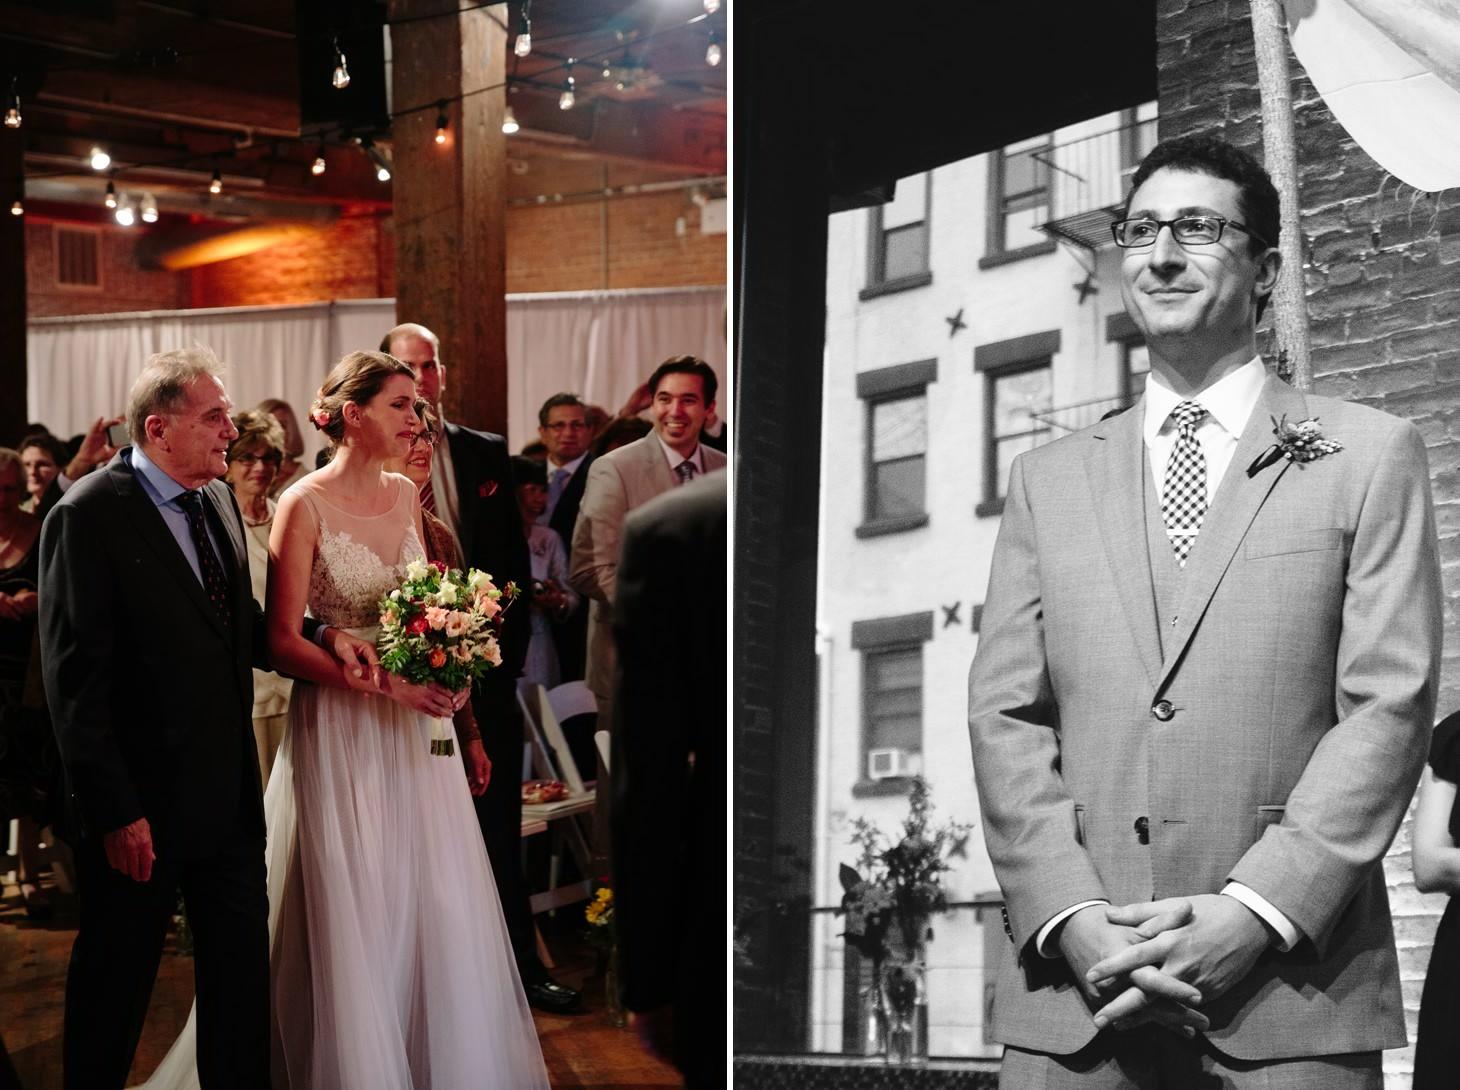 016-nyc-dumbo-loft-brooklyn-wedding-photographer-smitten-chickens-photo-.jpg